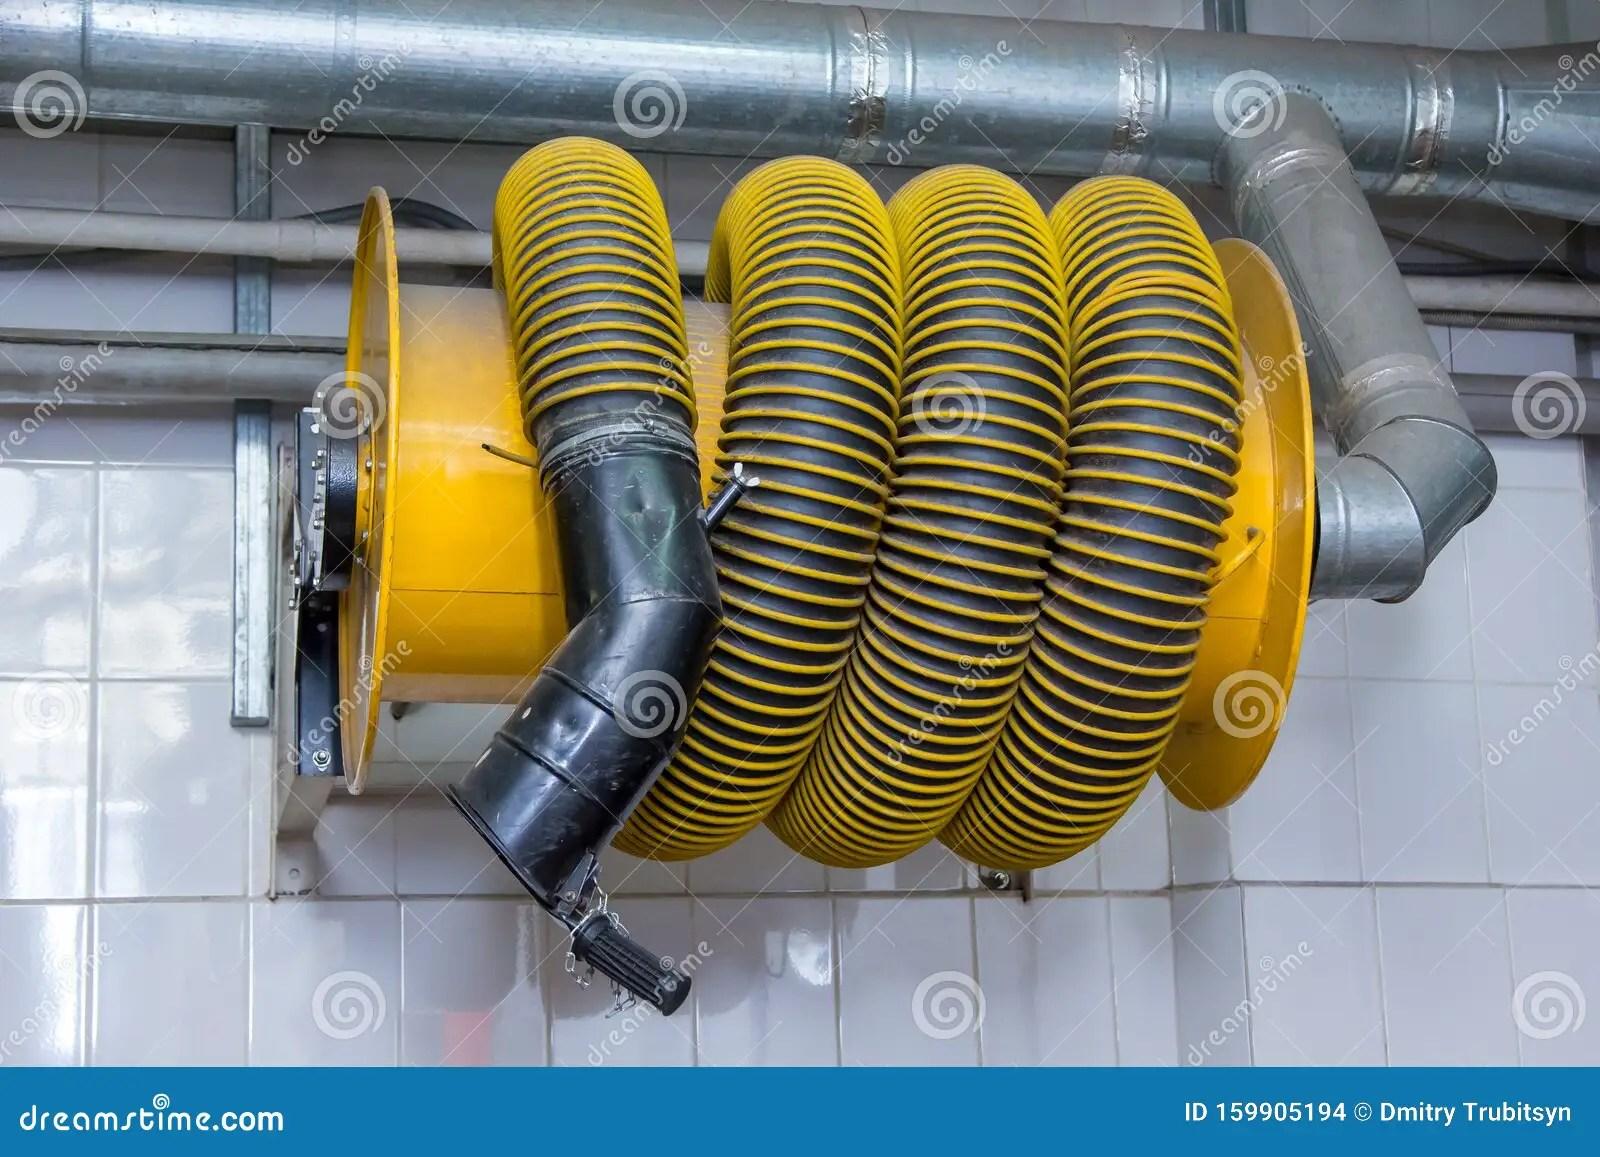 https www dreamstime com exhaust gas hose truck garage exhaust gas hose truck garage image159905194